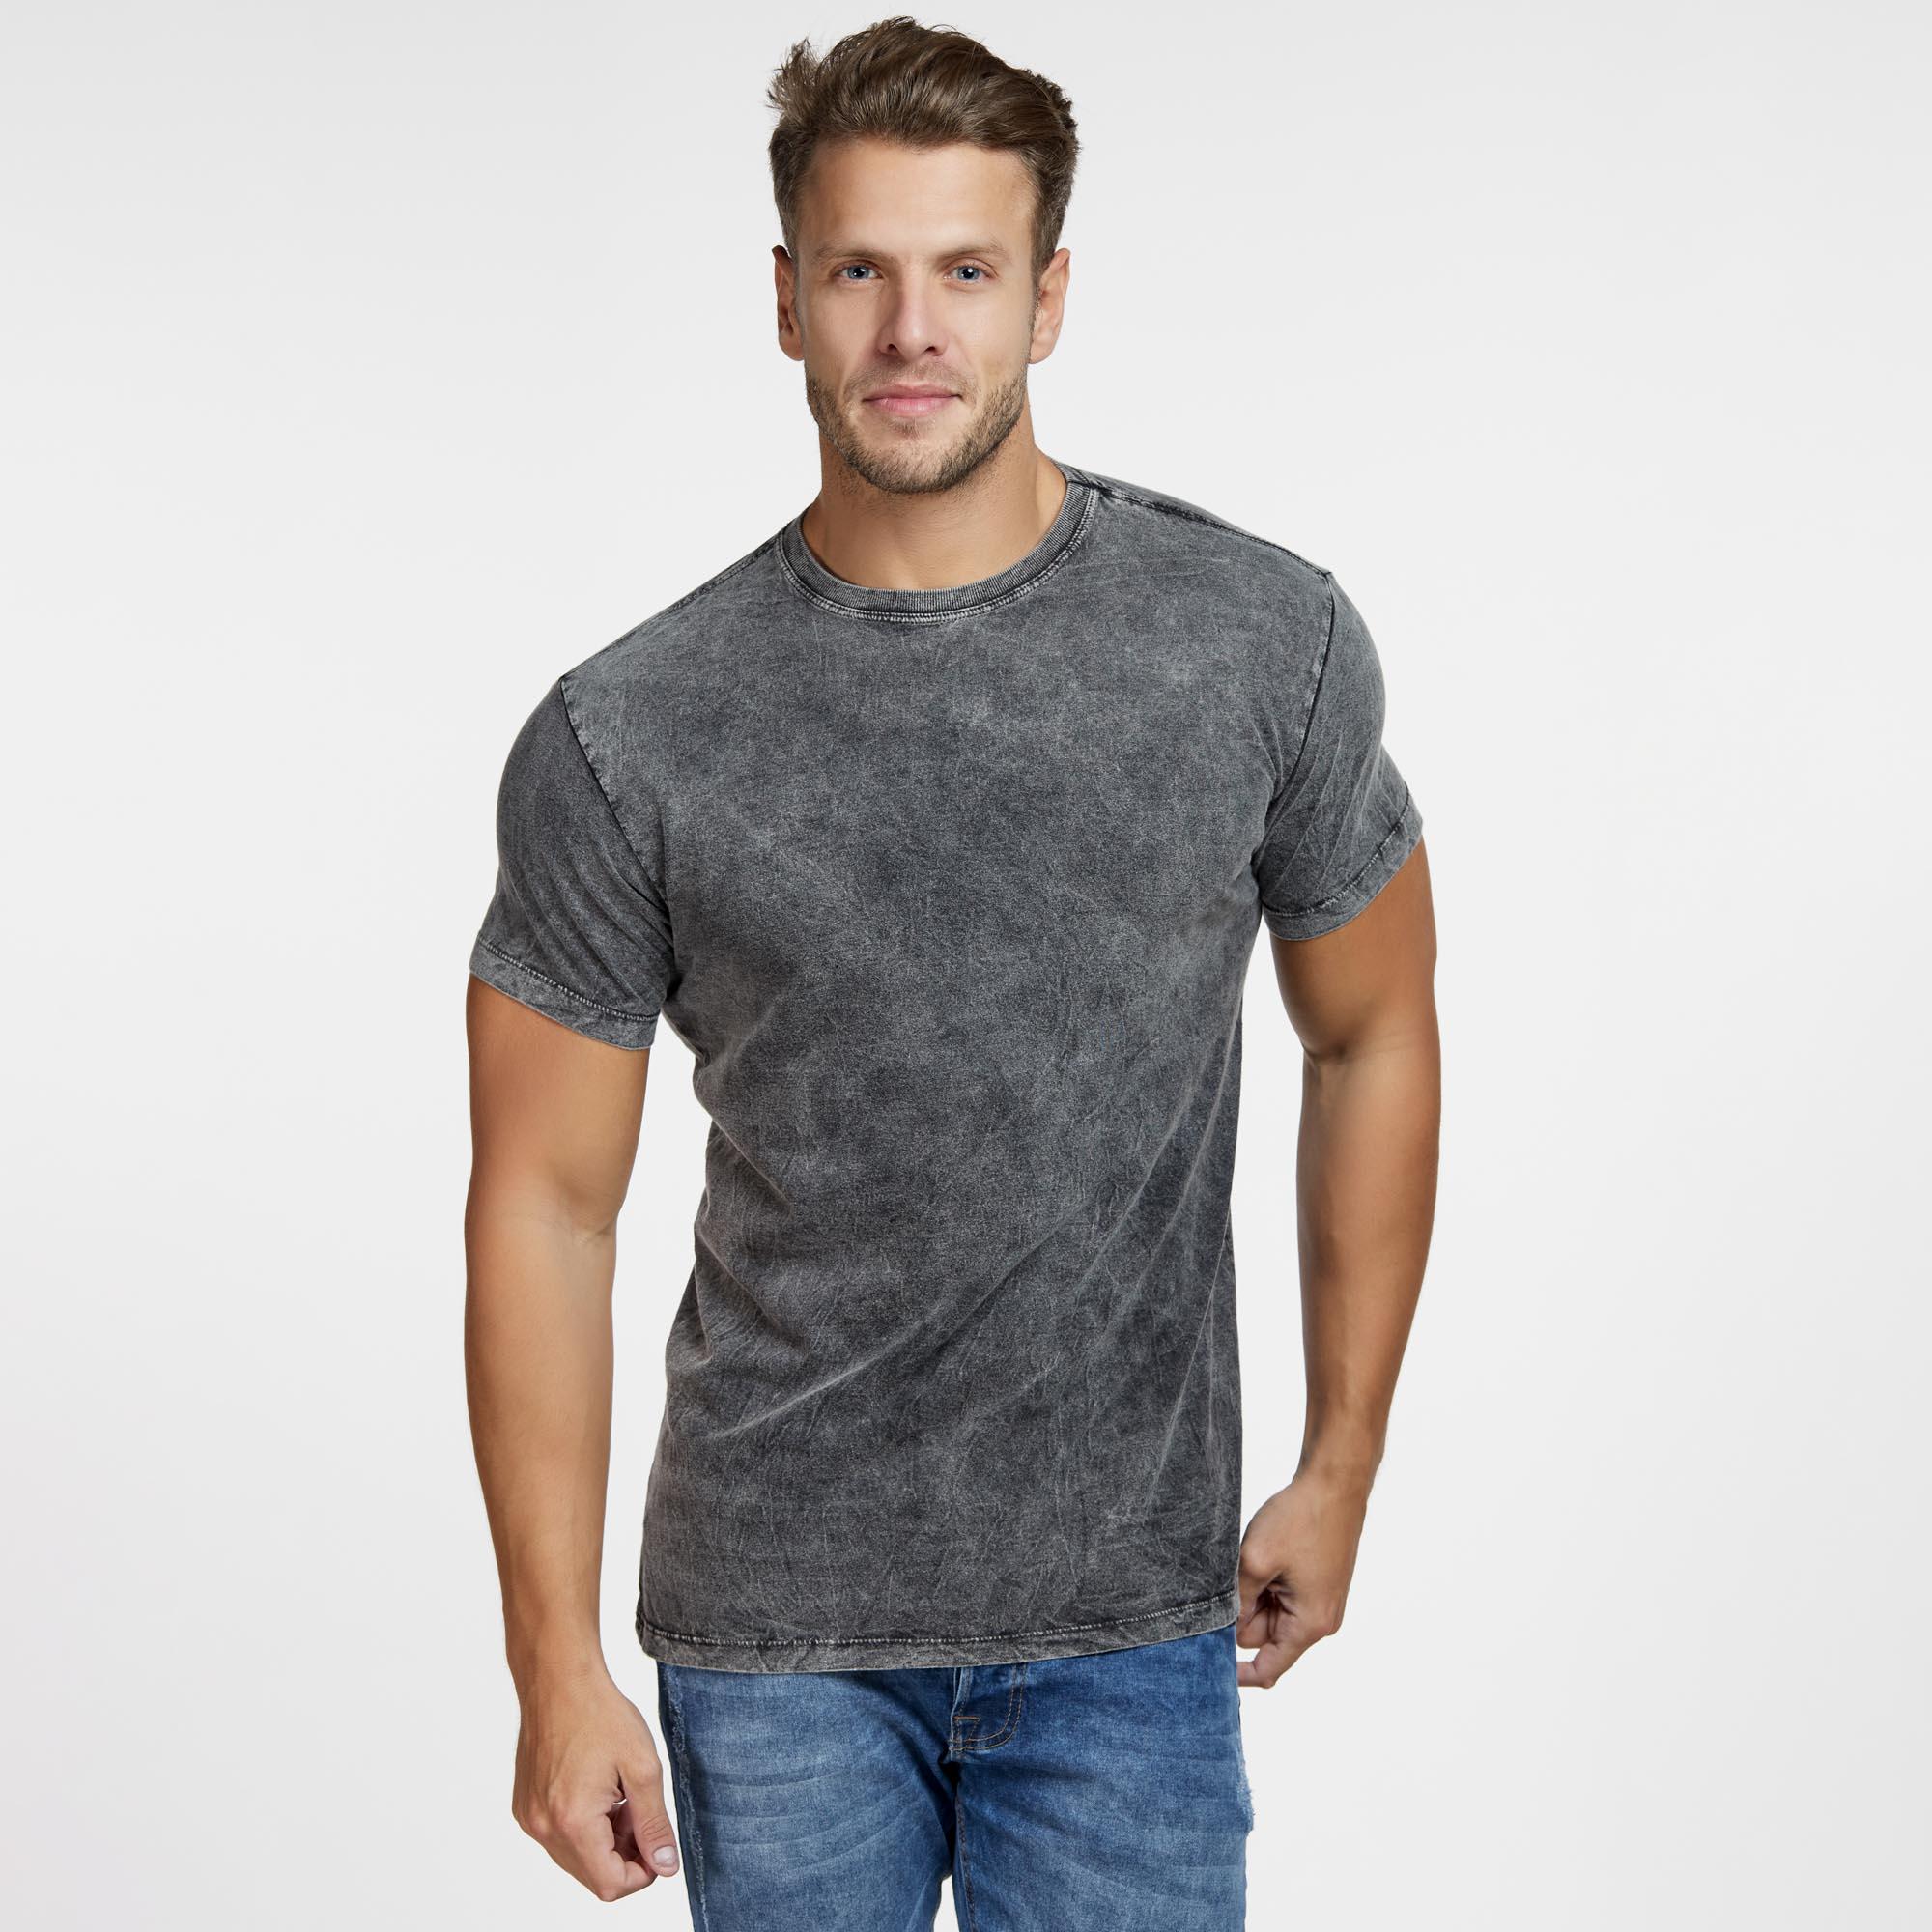 Camiseta Masculina Marmorizada Total Preta